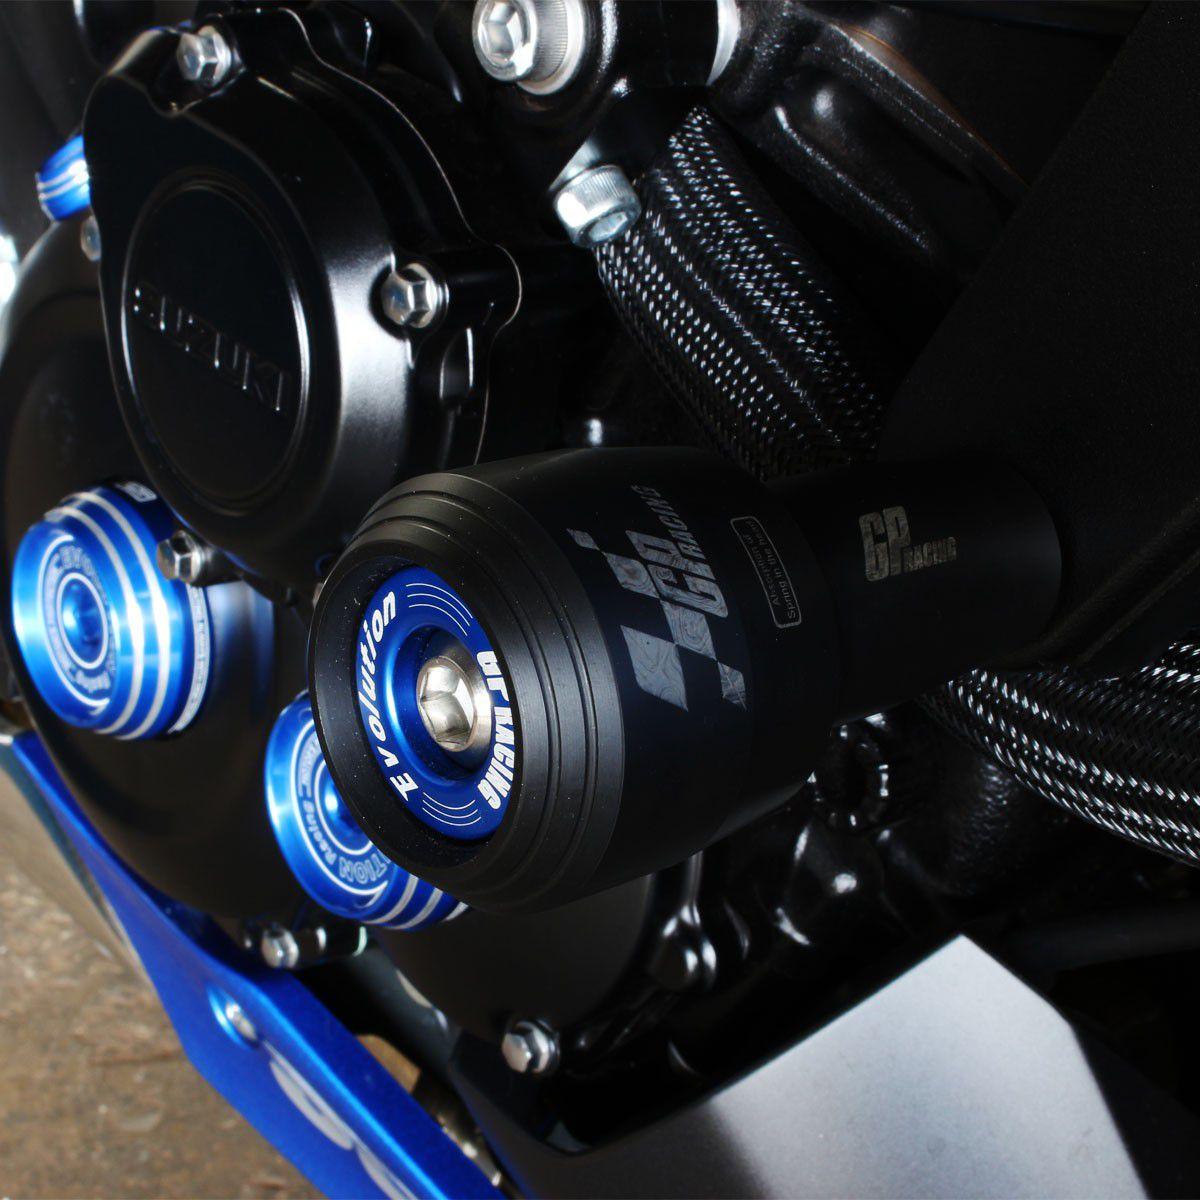 Slider Evolution GP Nylon GSXR GSX R Srad 750 96 97 98 99 00